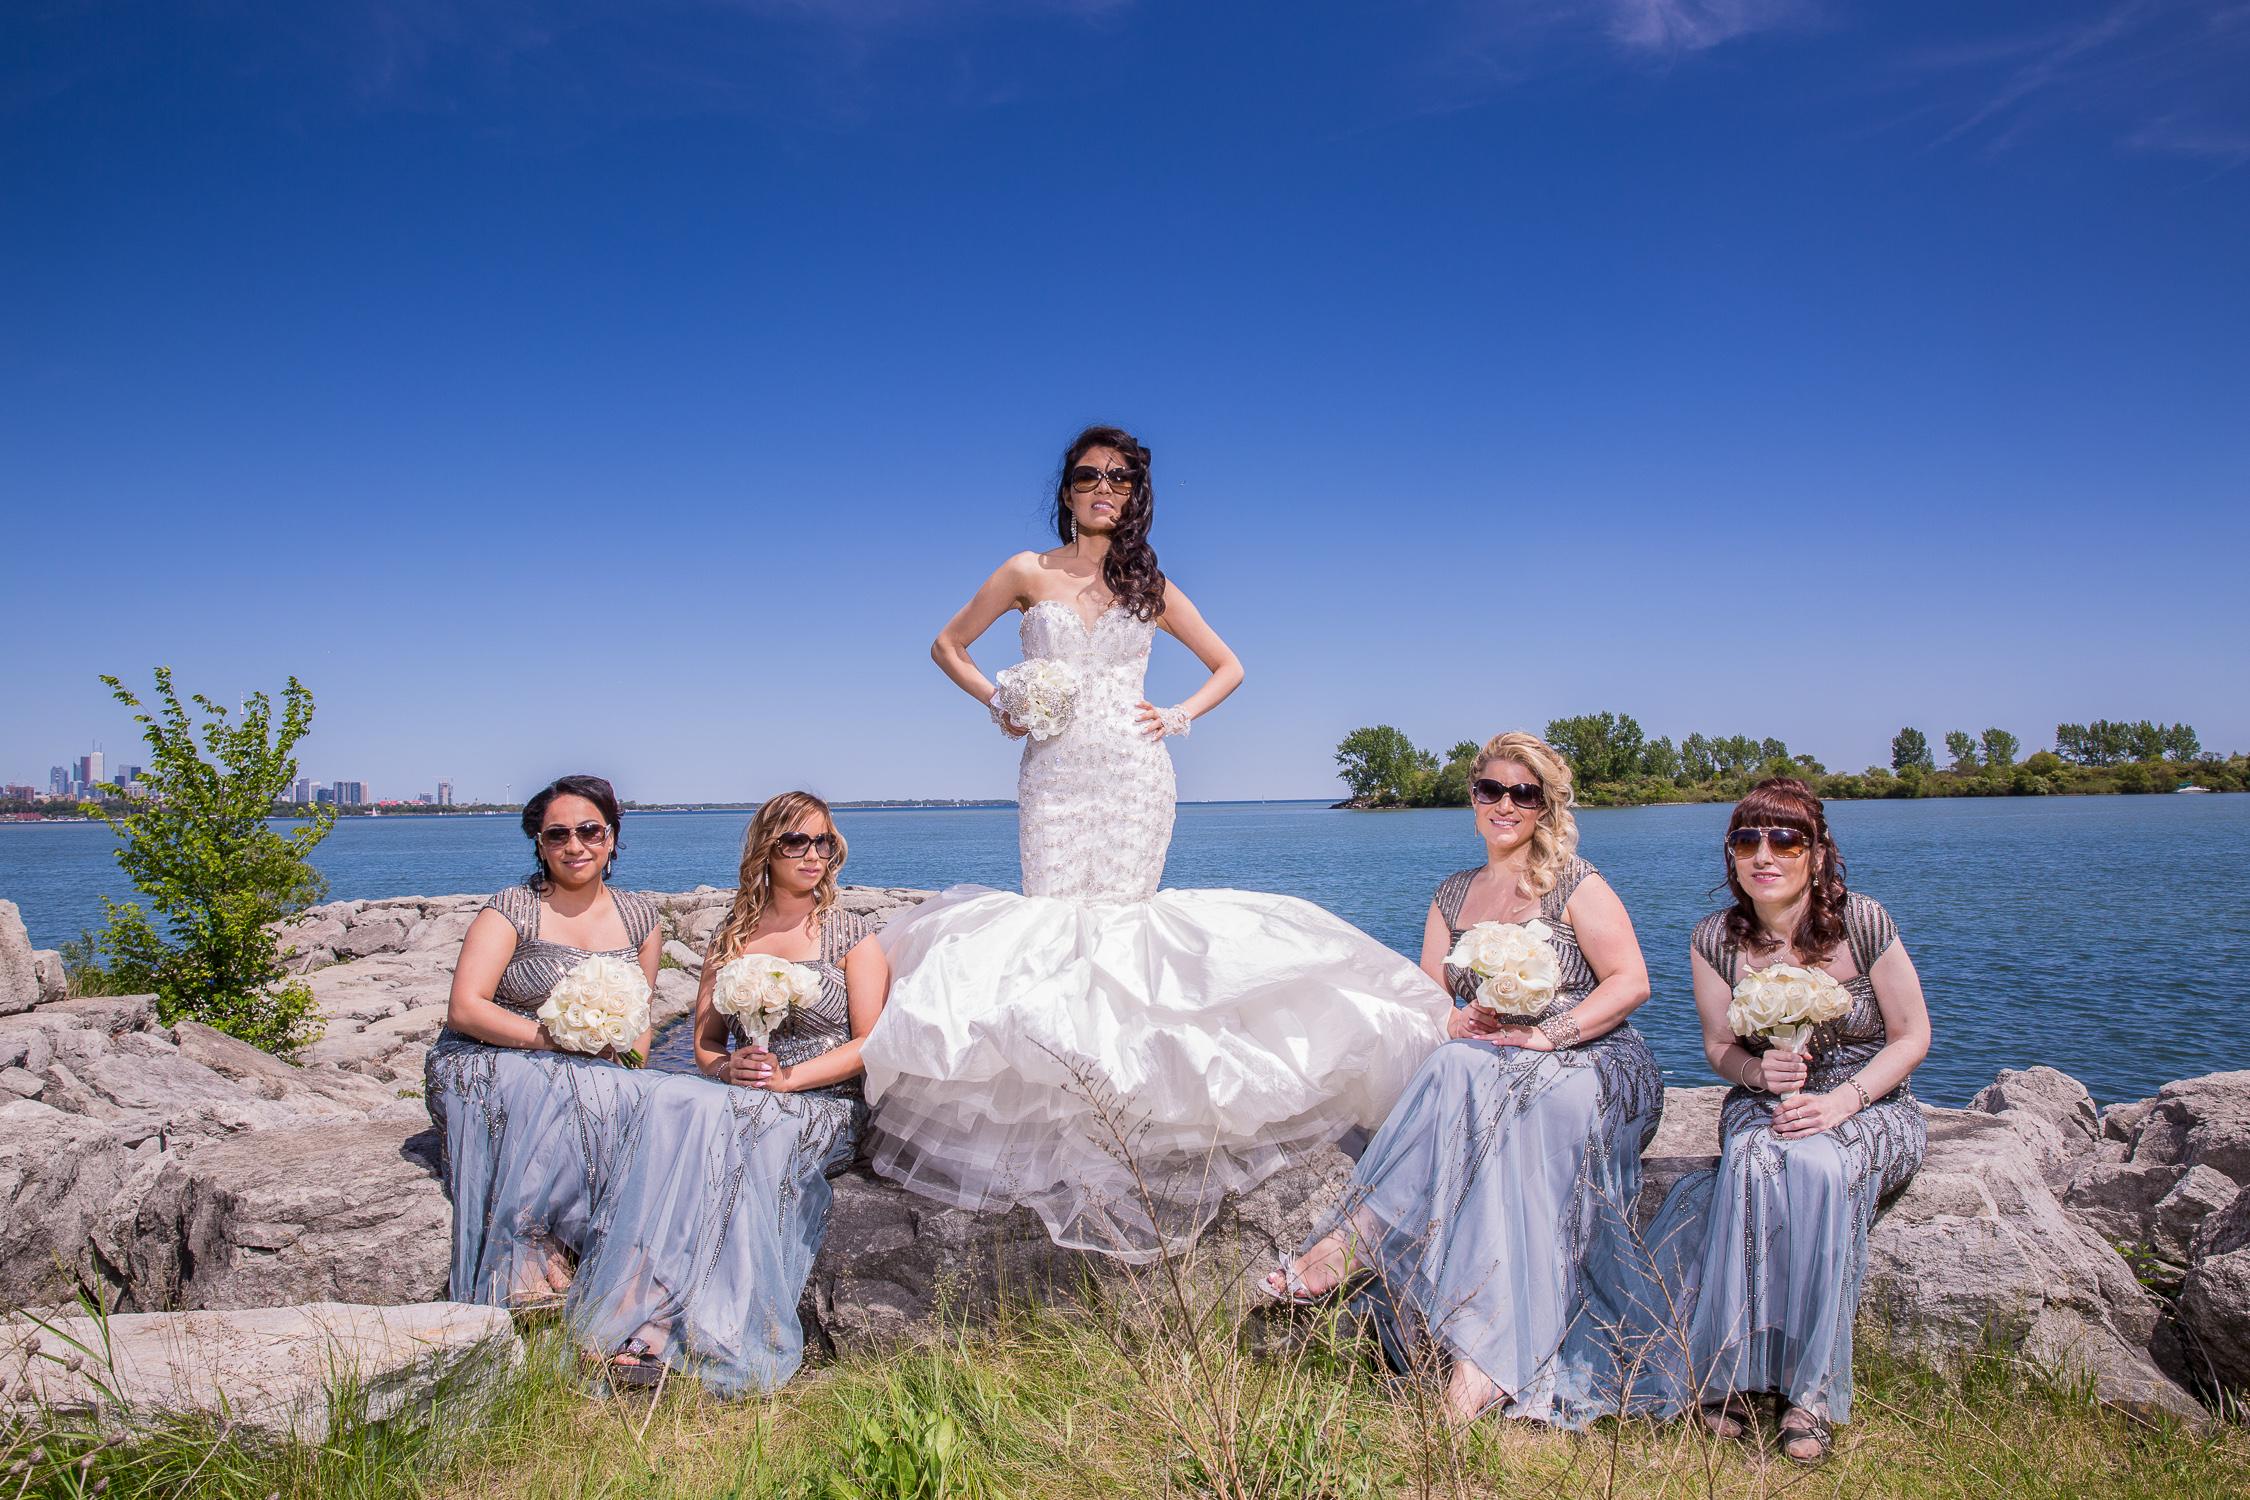 Paradise-Banquet-Hall-Wedding-Vaughan-Ontario-0060.jpg